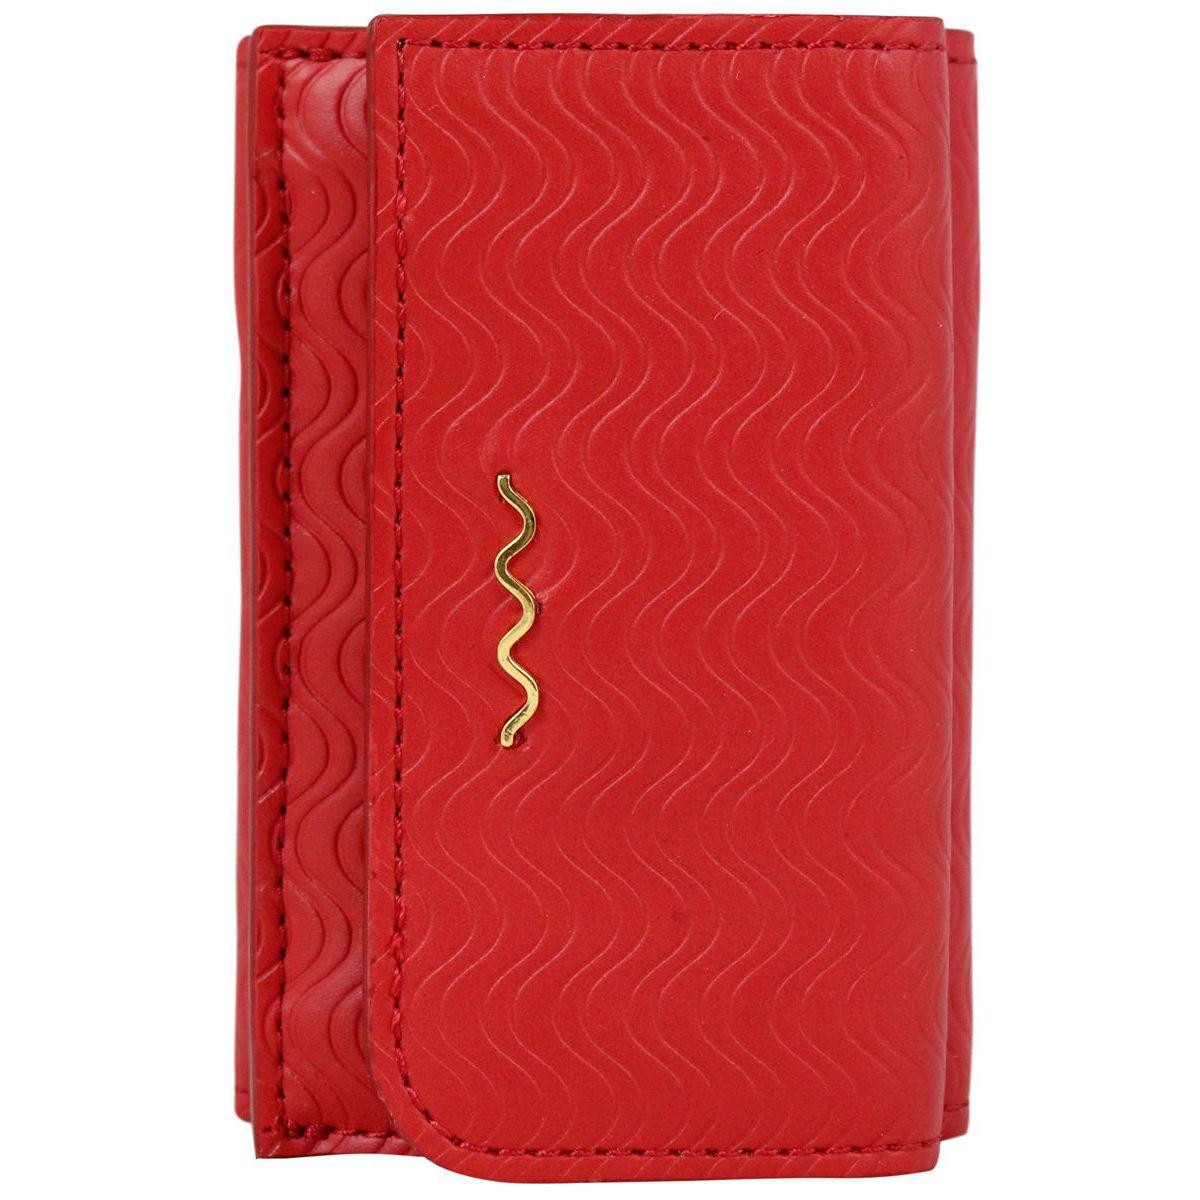 Blandine Silk Wallet in leather Red Zanellato